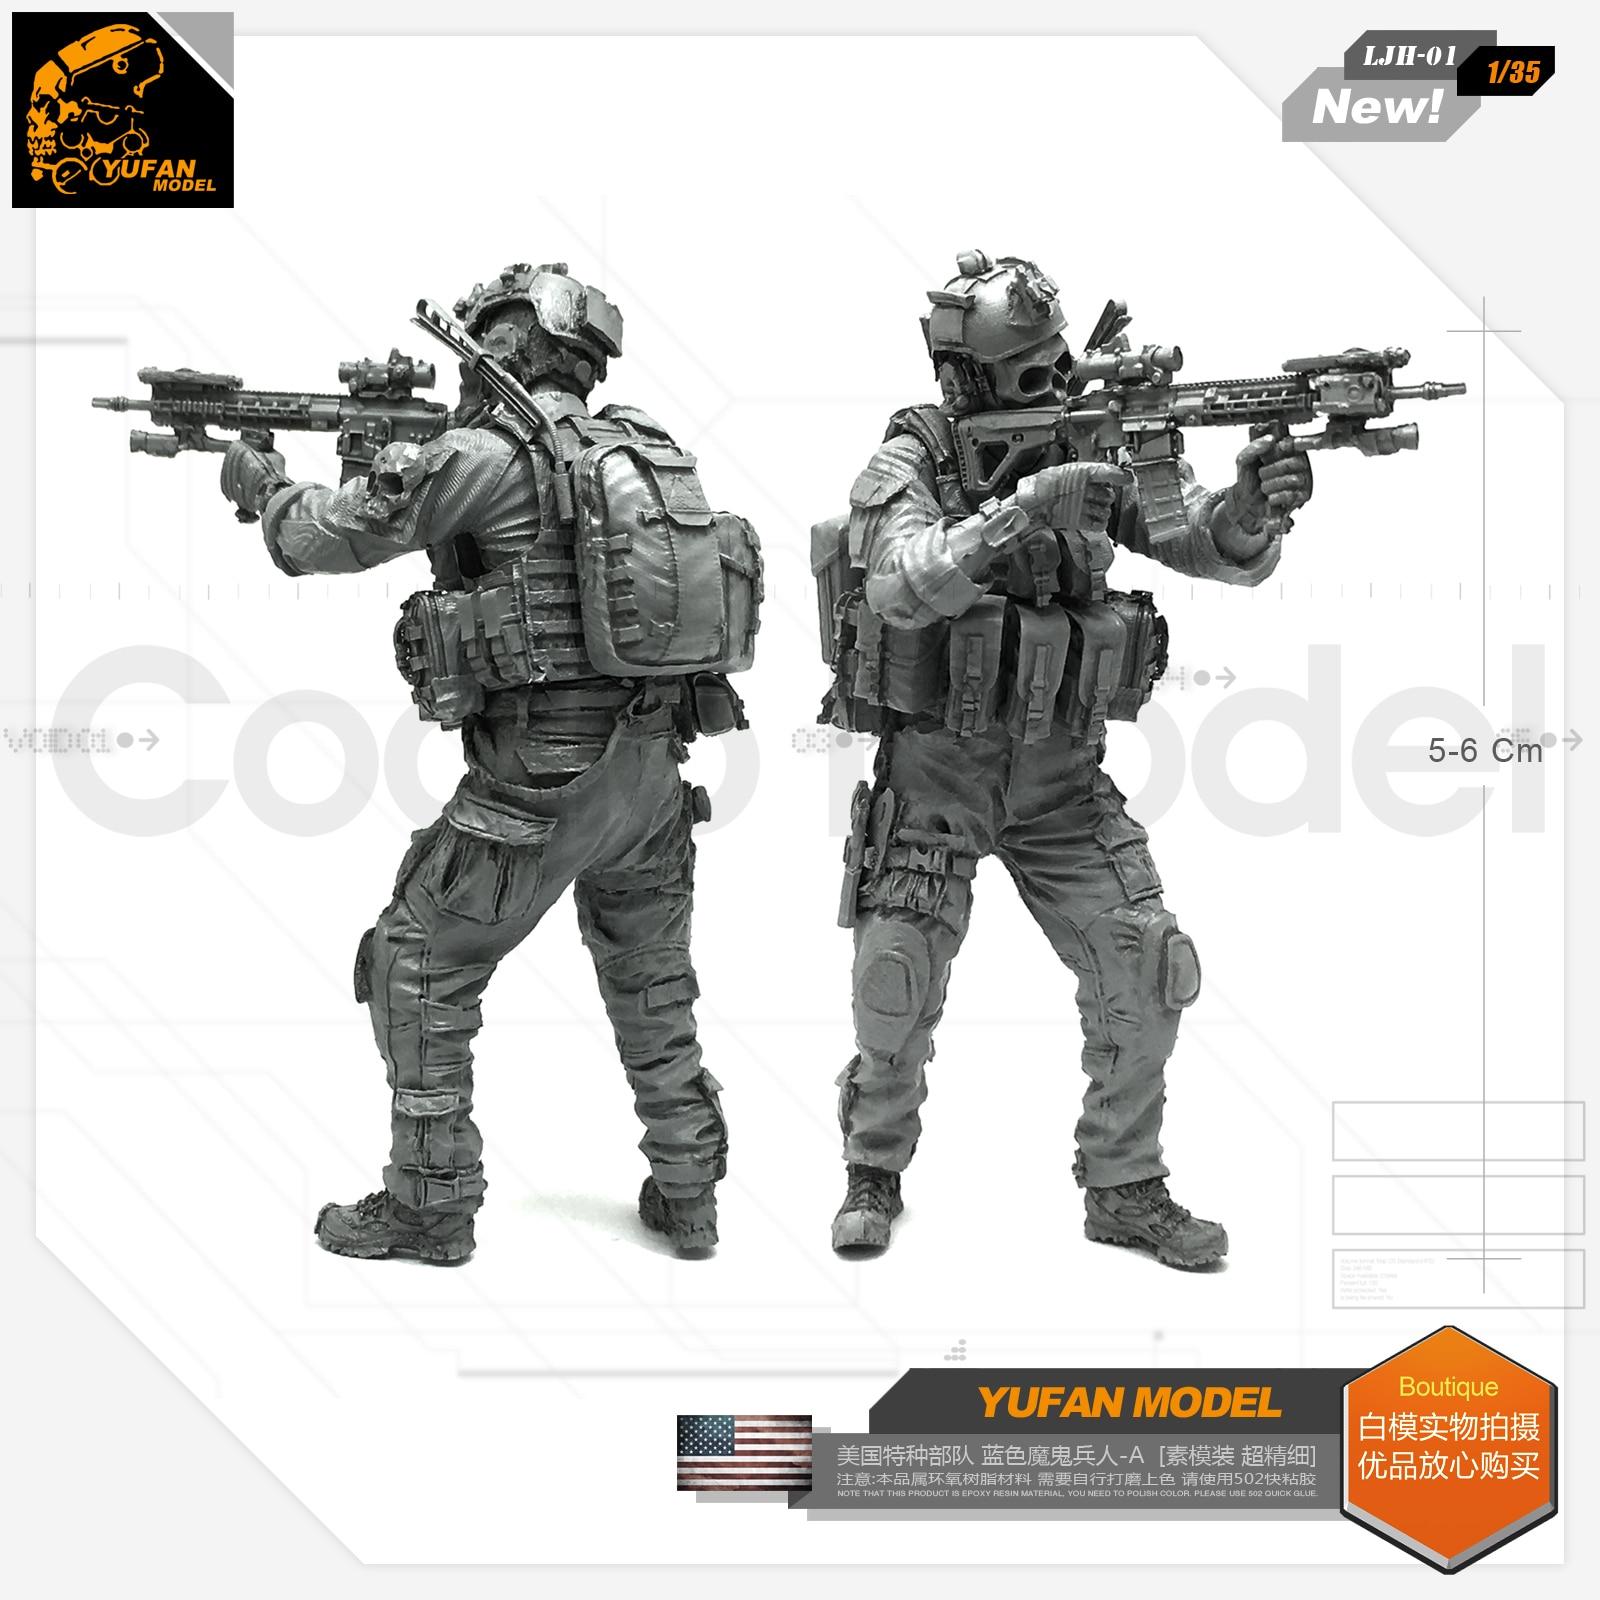 1/35 U.s. Special Forces Troops Blue Devil Soldier Resin Model Ljh - 01